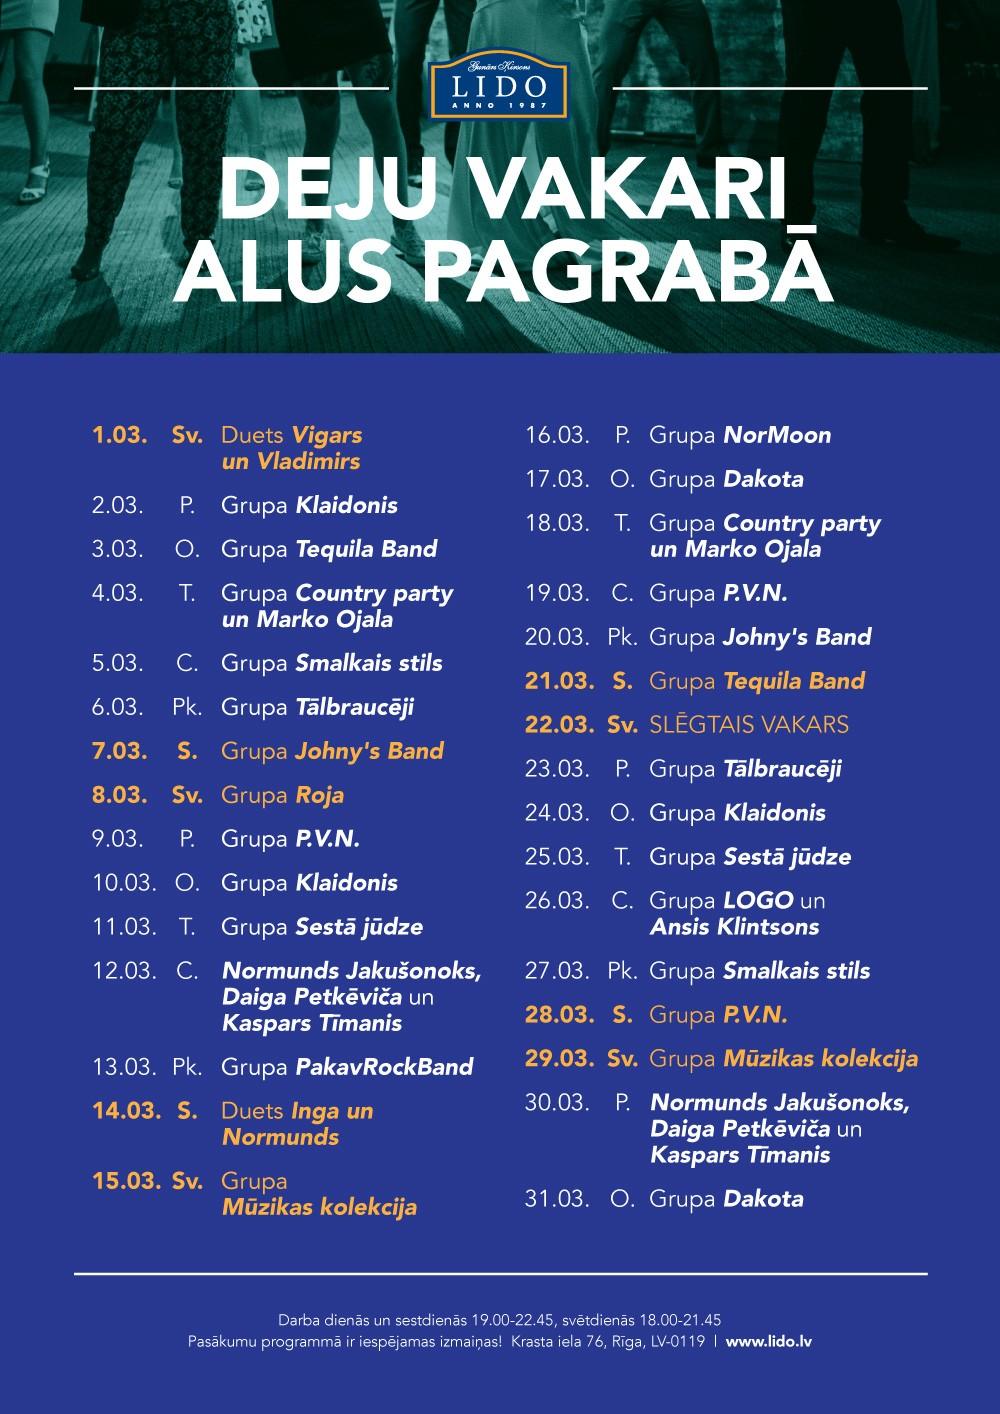 DejuVakariPagrabs-Marts-A4-02.2020-1.jpg